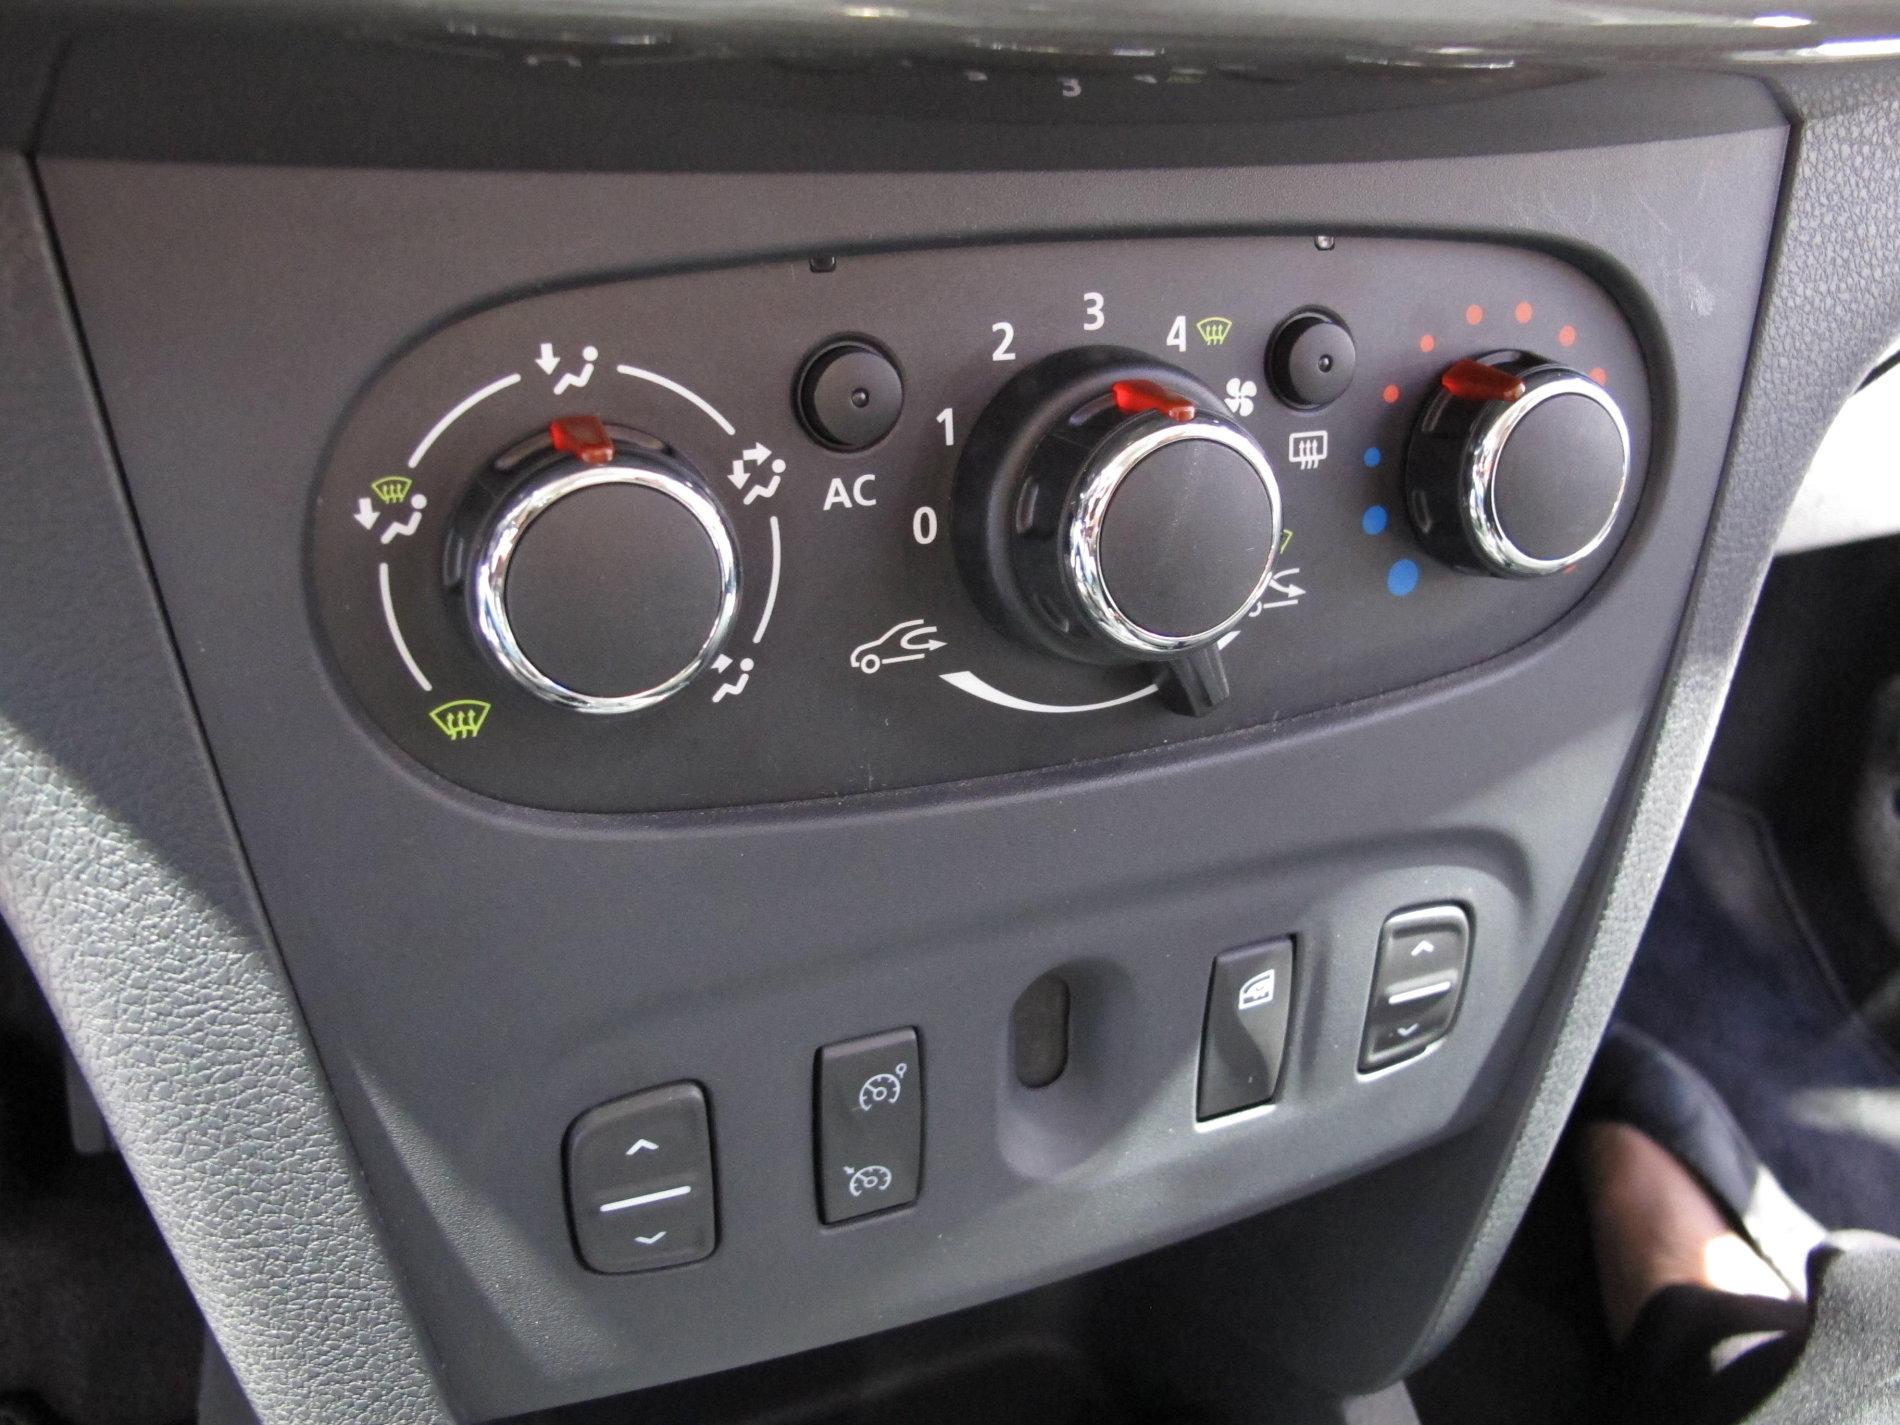 Dacia Logan 2: absolut toate detaliile despre noul Logan 2013 - Dacia Logan 2: absolut toate detaliile despre noul Logan 2013